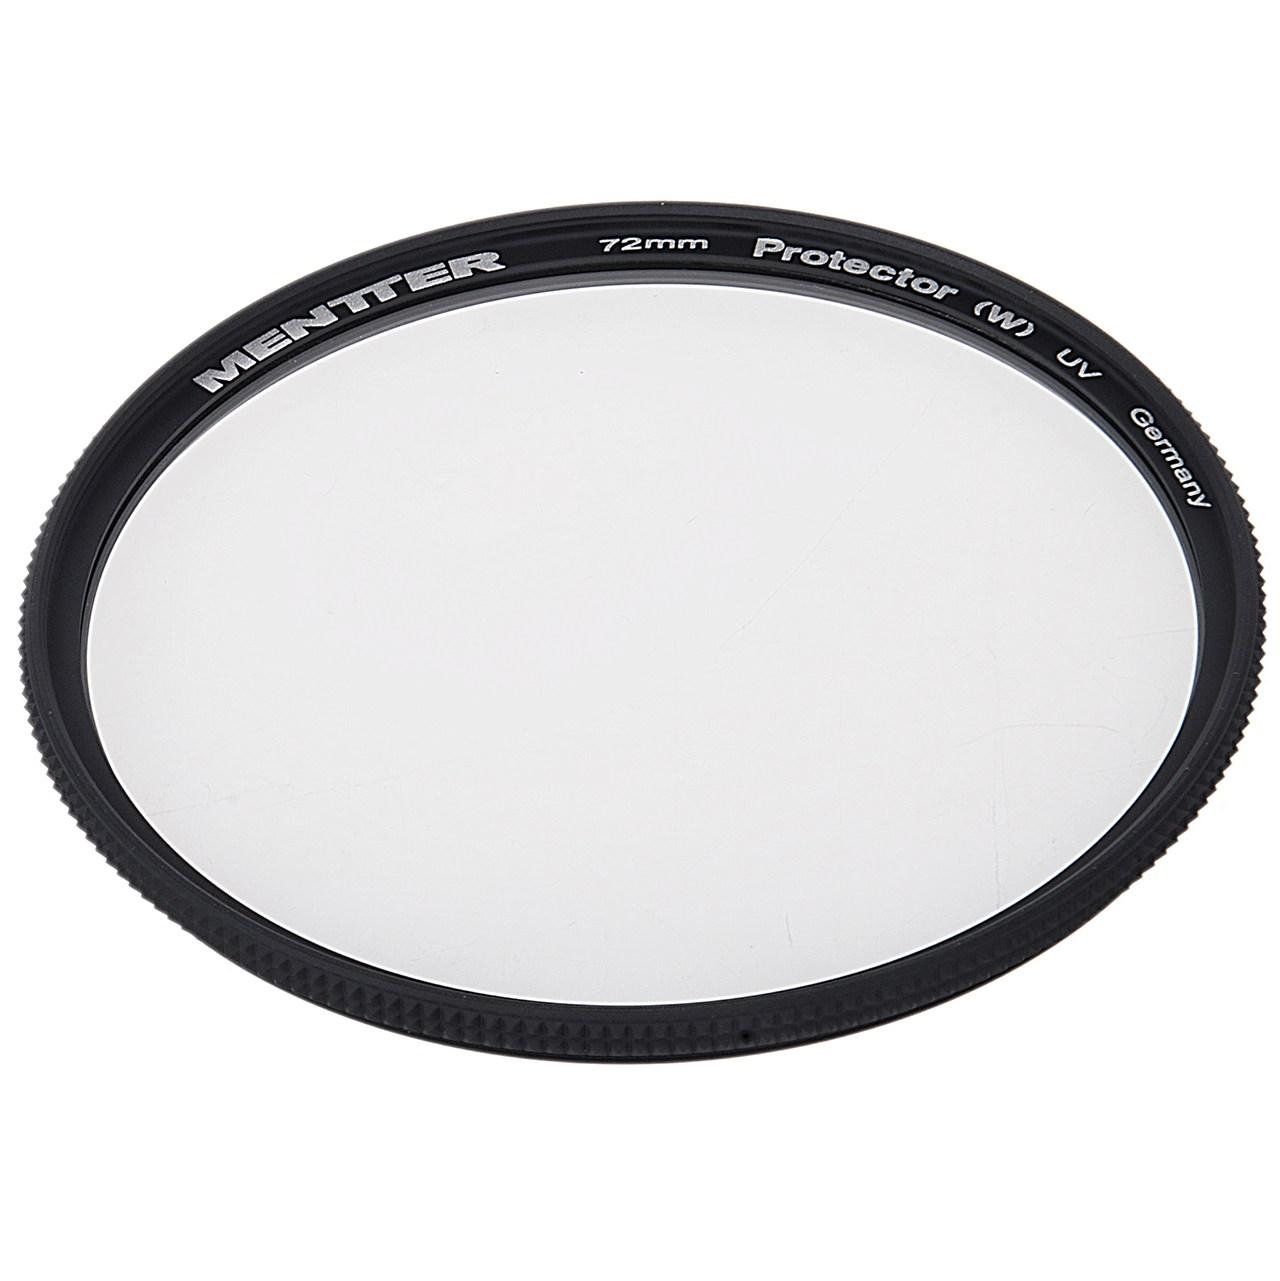 فیلتر لنز منتر مدل Protector UV 72mm